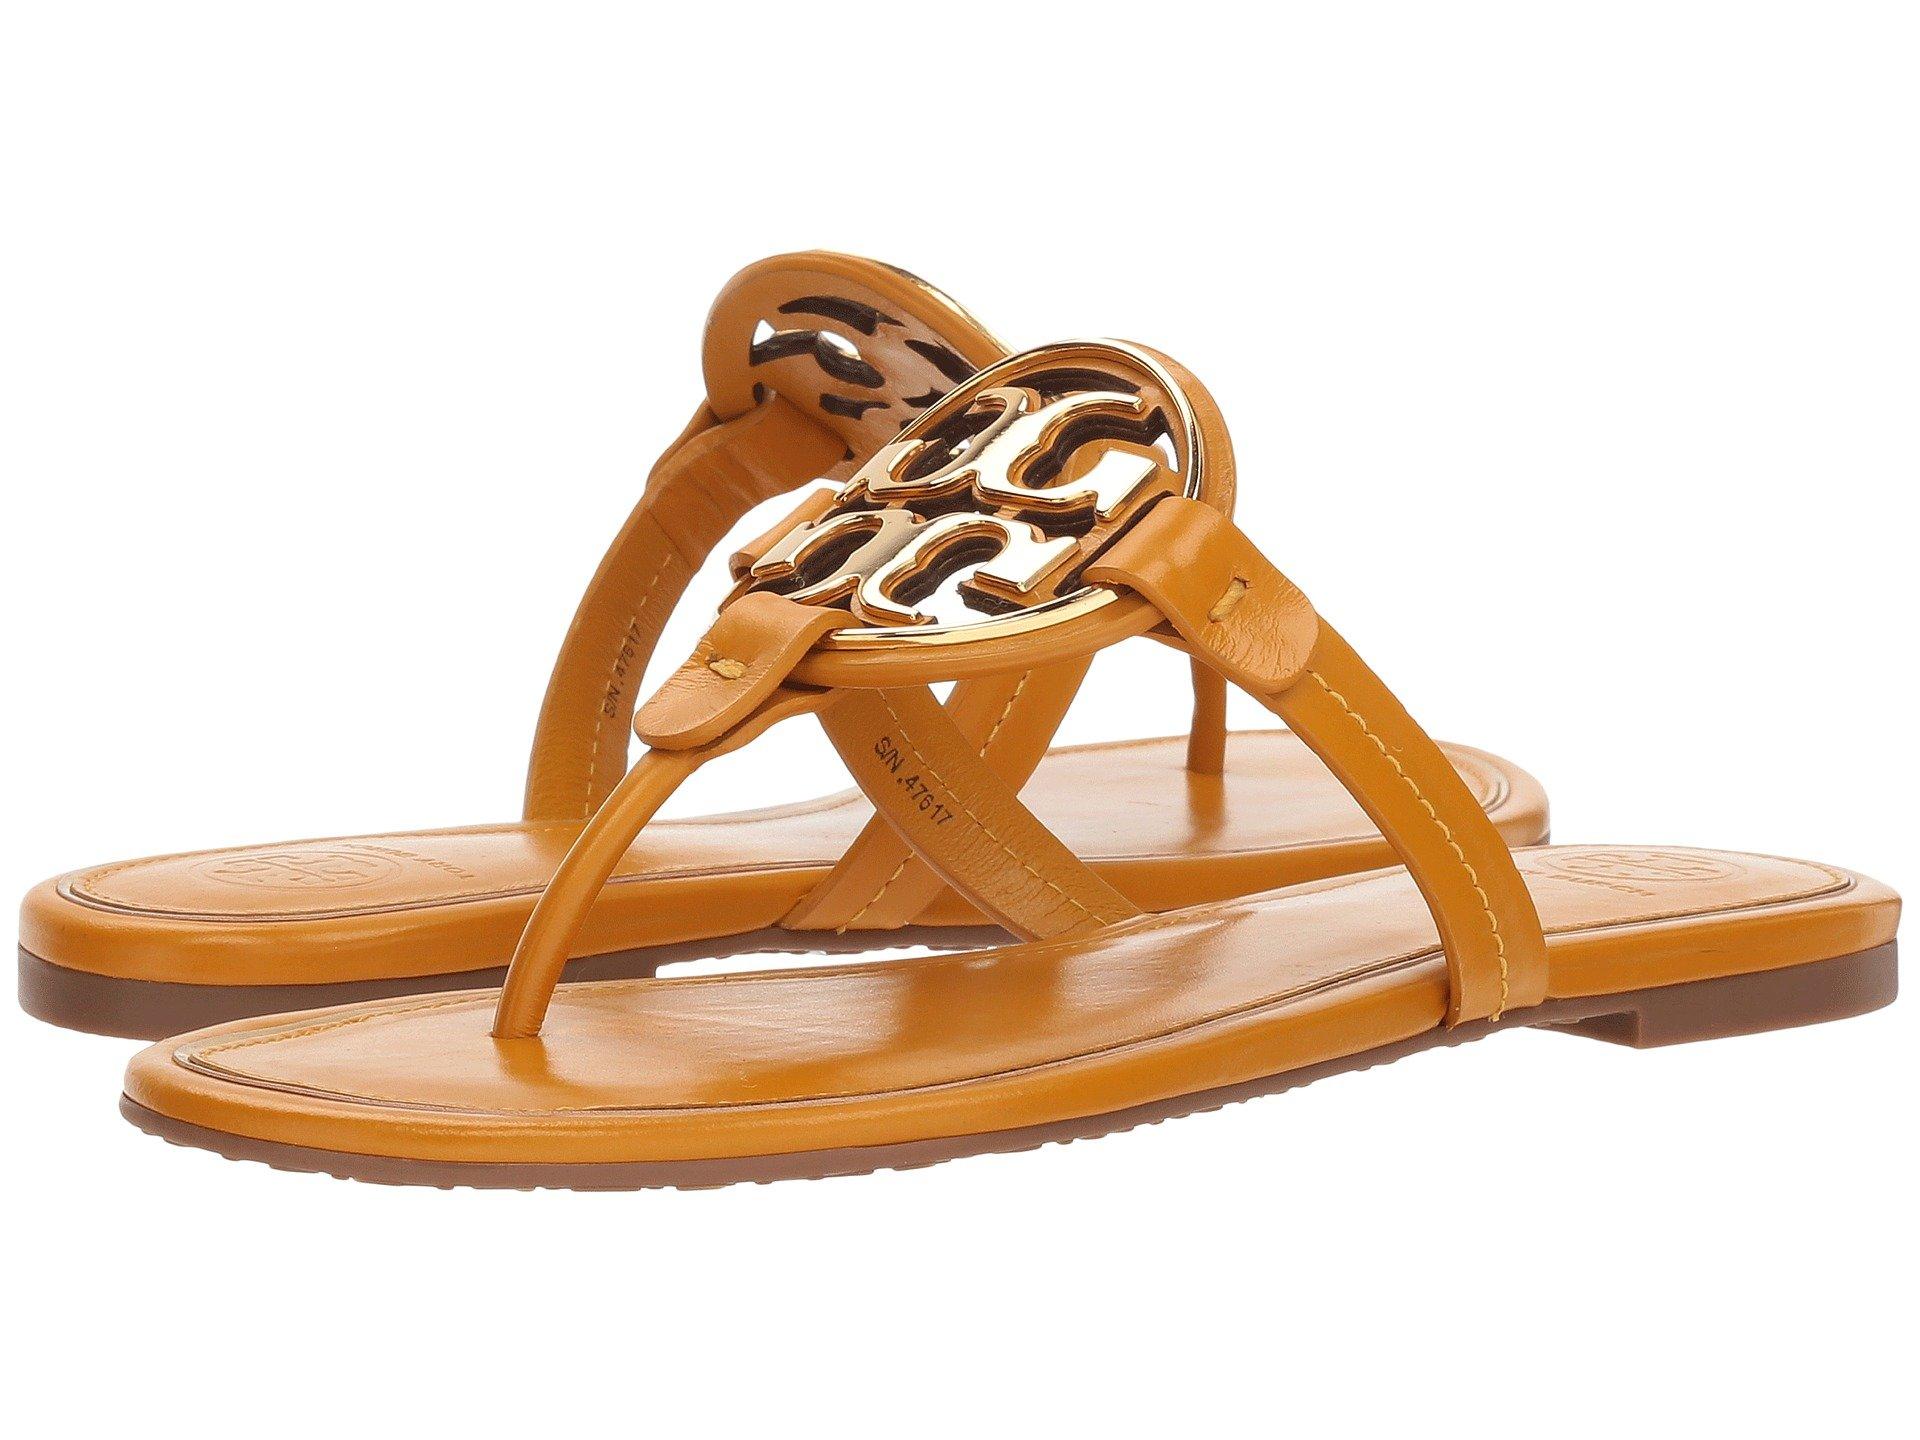 da00889e3 Zappos  Tory Burch Metal Miller sandals – 40% Off + Free Shipping ...